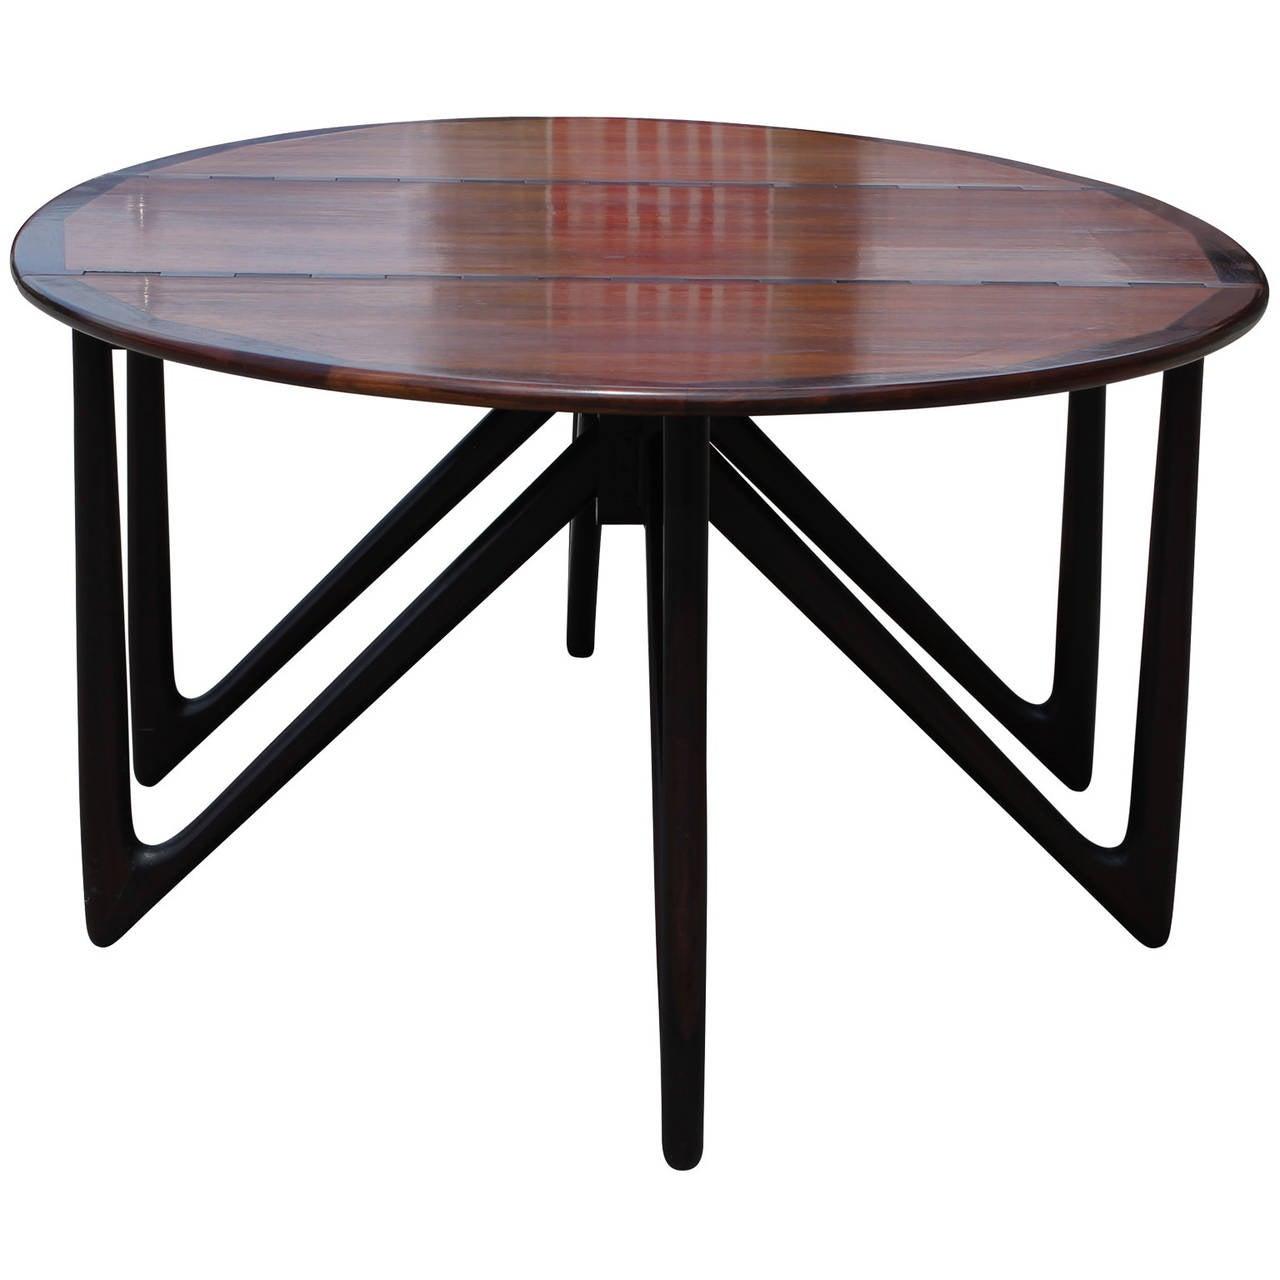 Kurt Ostervig Gateleg Rosewood Dining Table at 1stdibs : kurtostervigtable3l from www.1stdibs.com size 1280 x 1280 jpeg 84kB